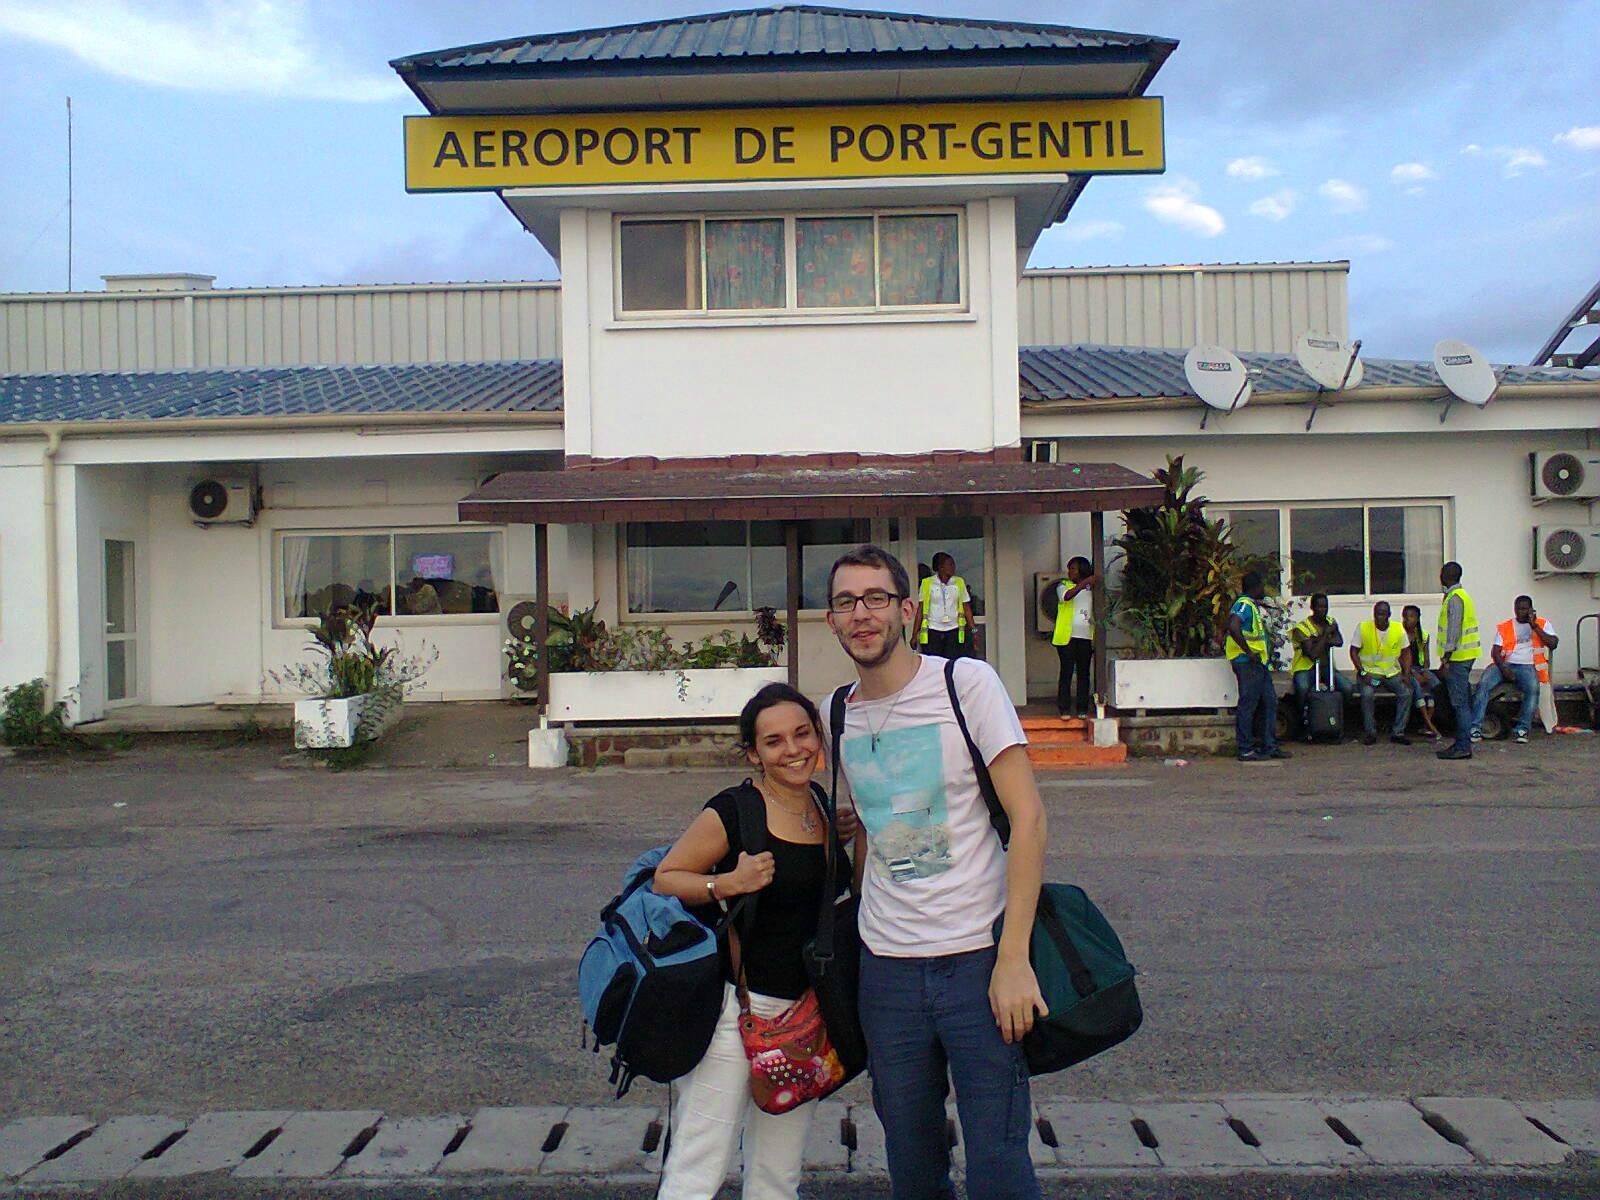 Arriv e port gentil tominata pog entre h misph res sud et nord - Consulat de france port gentil ...